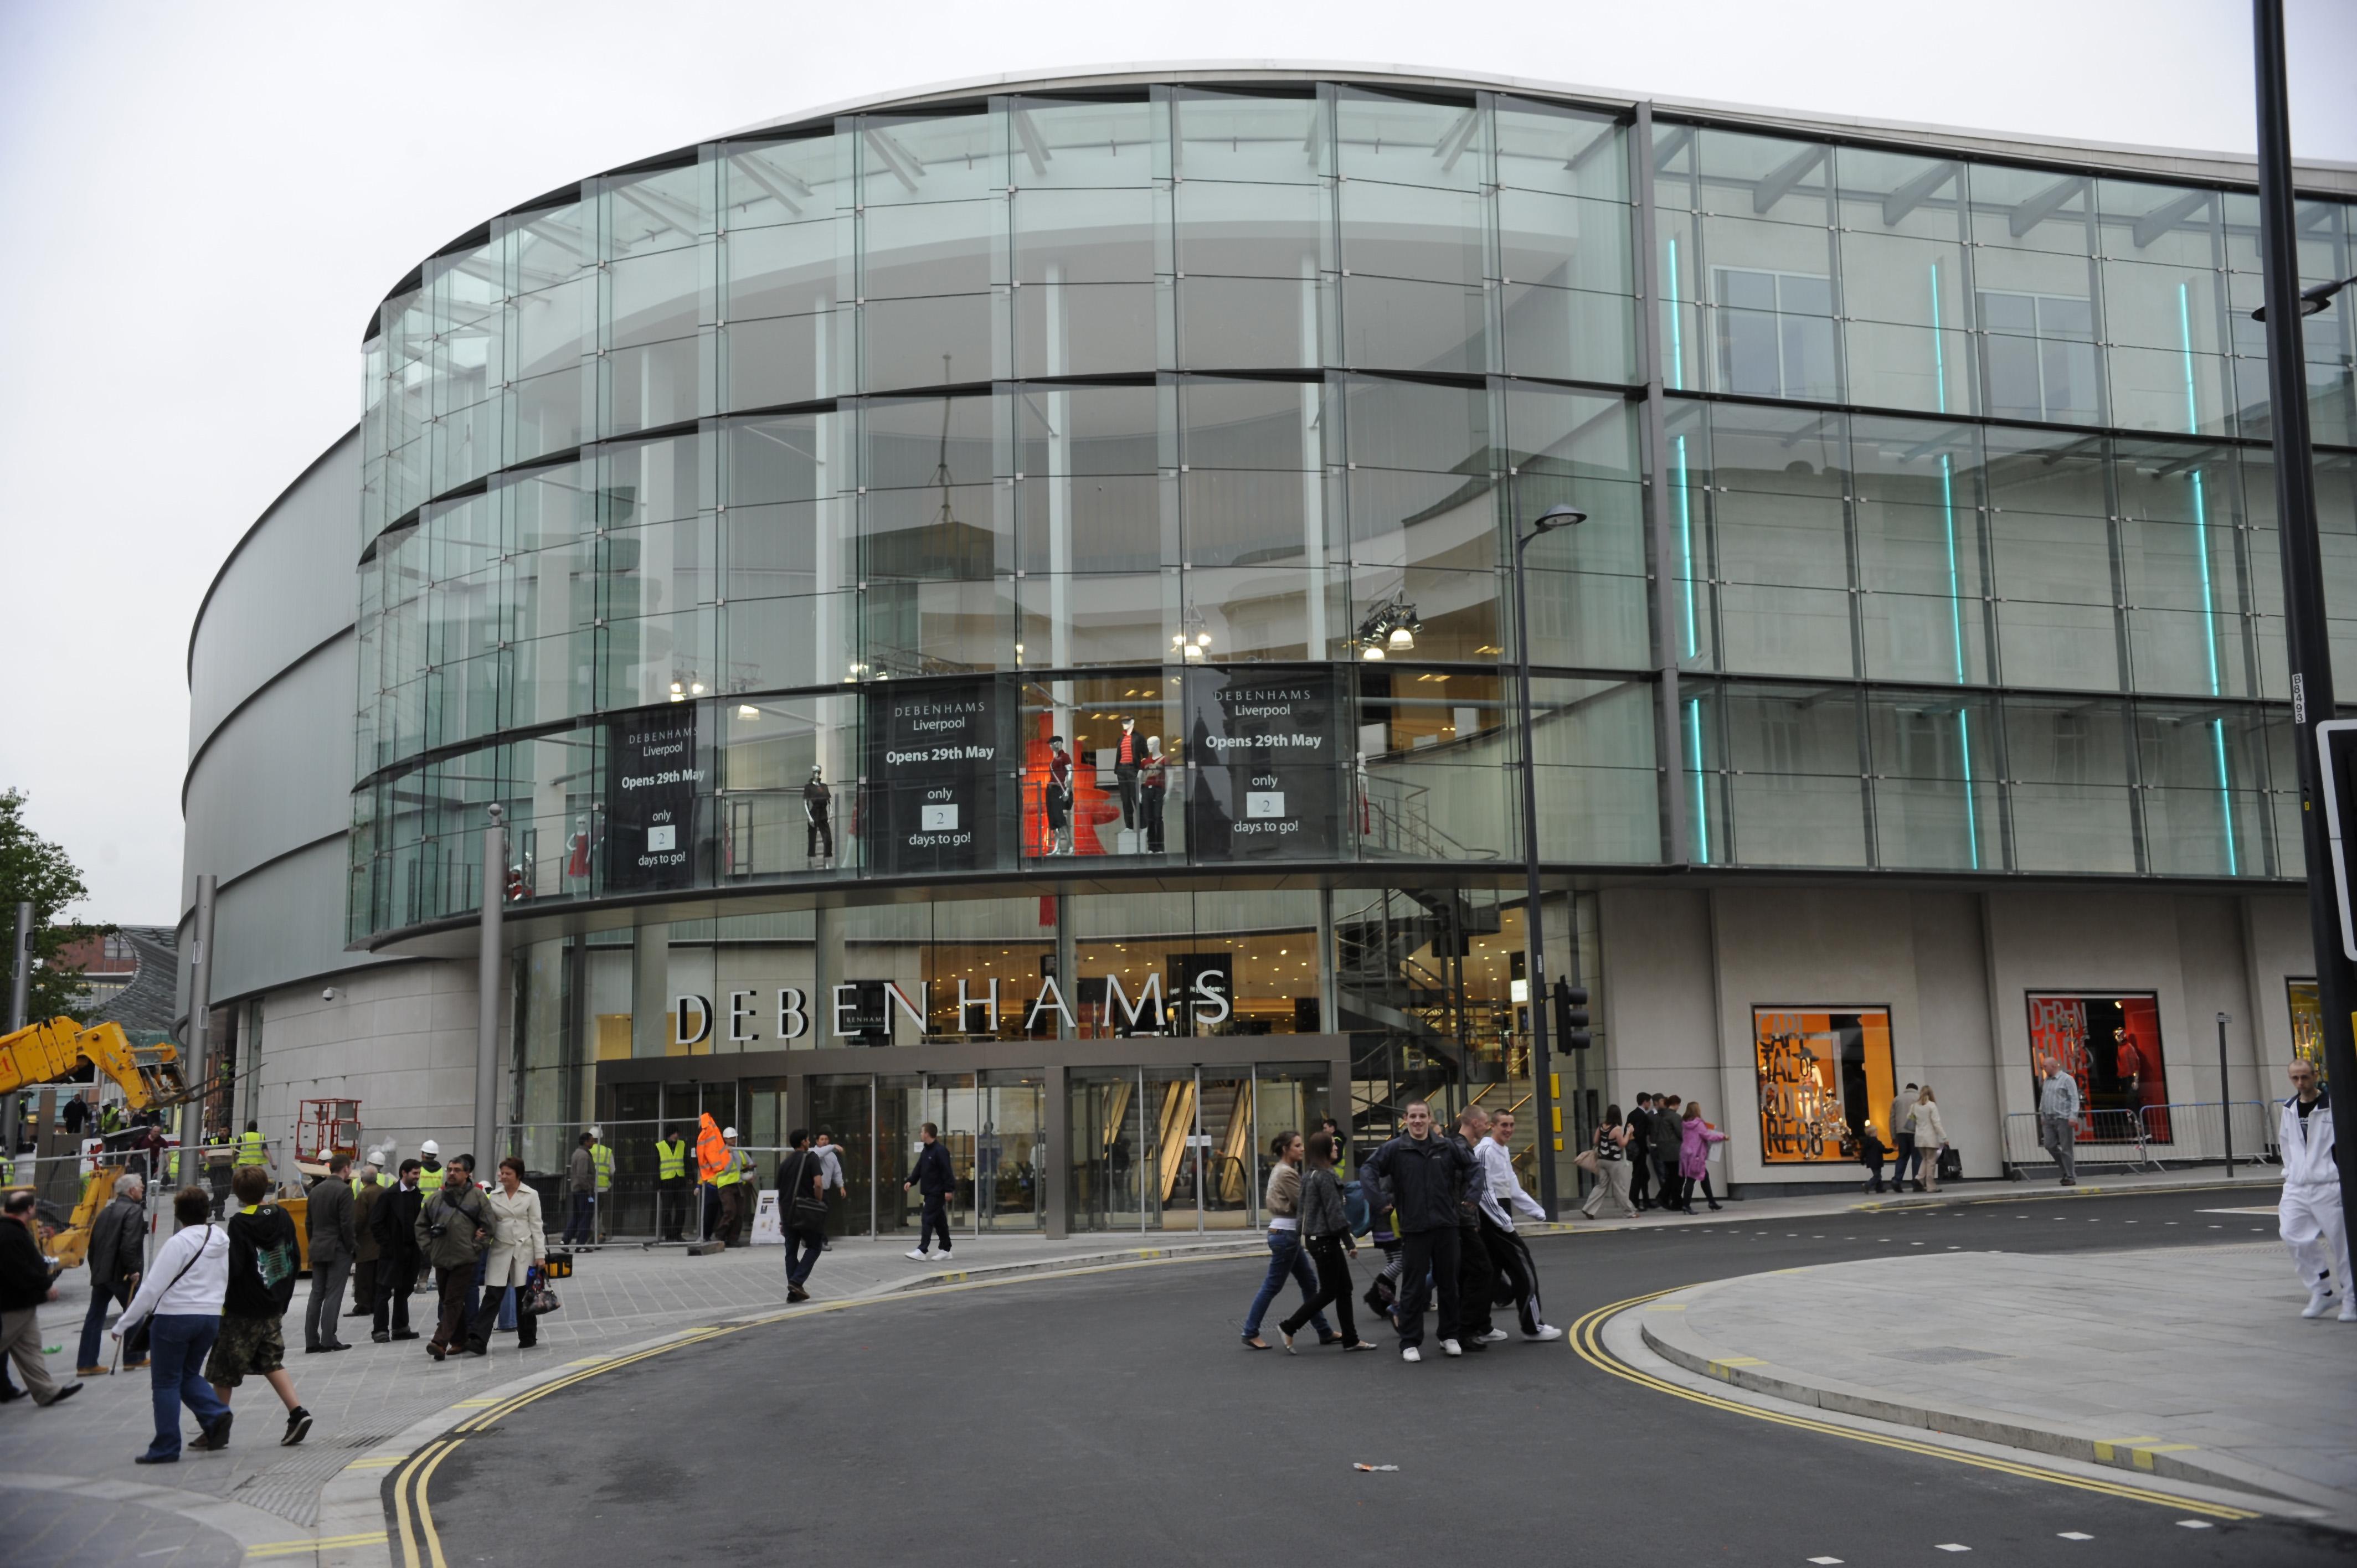 Debenhams Readies Social Co-buying Strategy for Christmas 2014